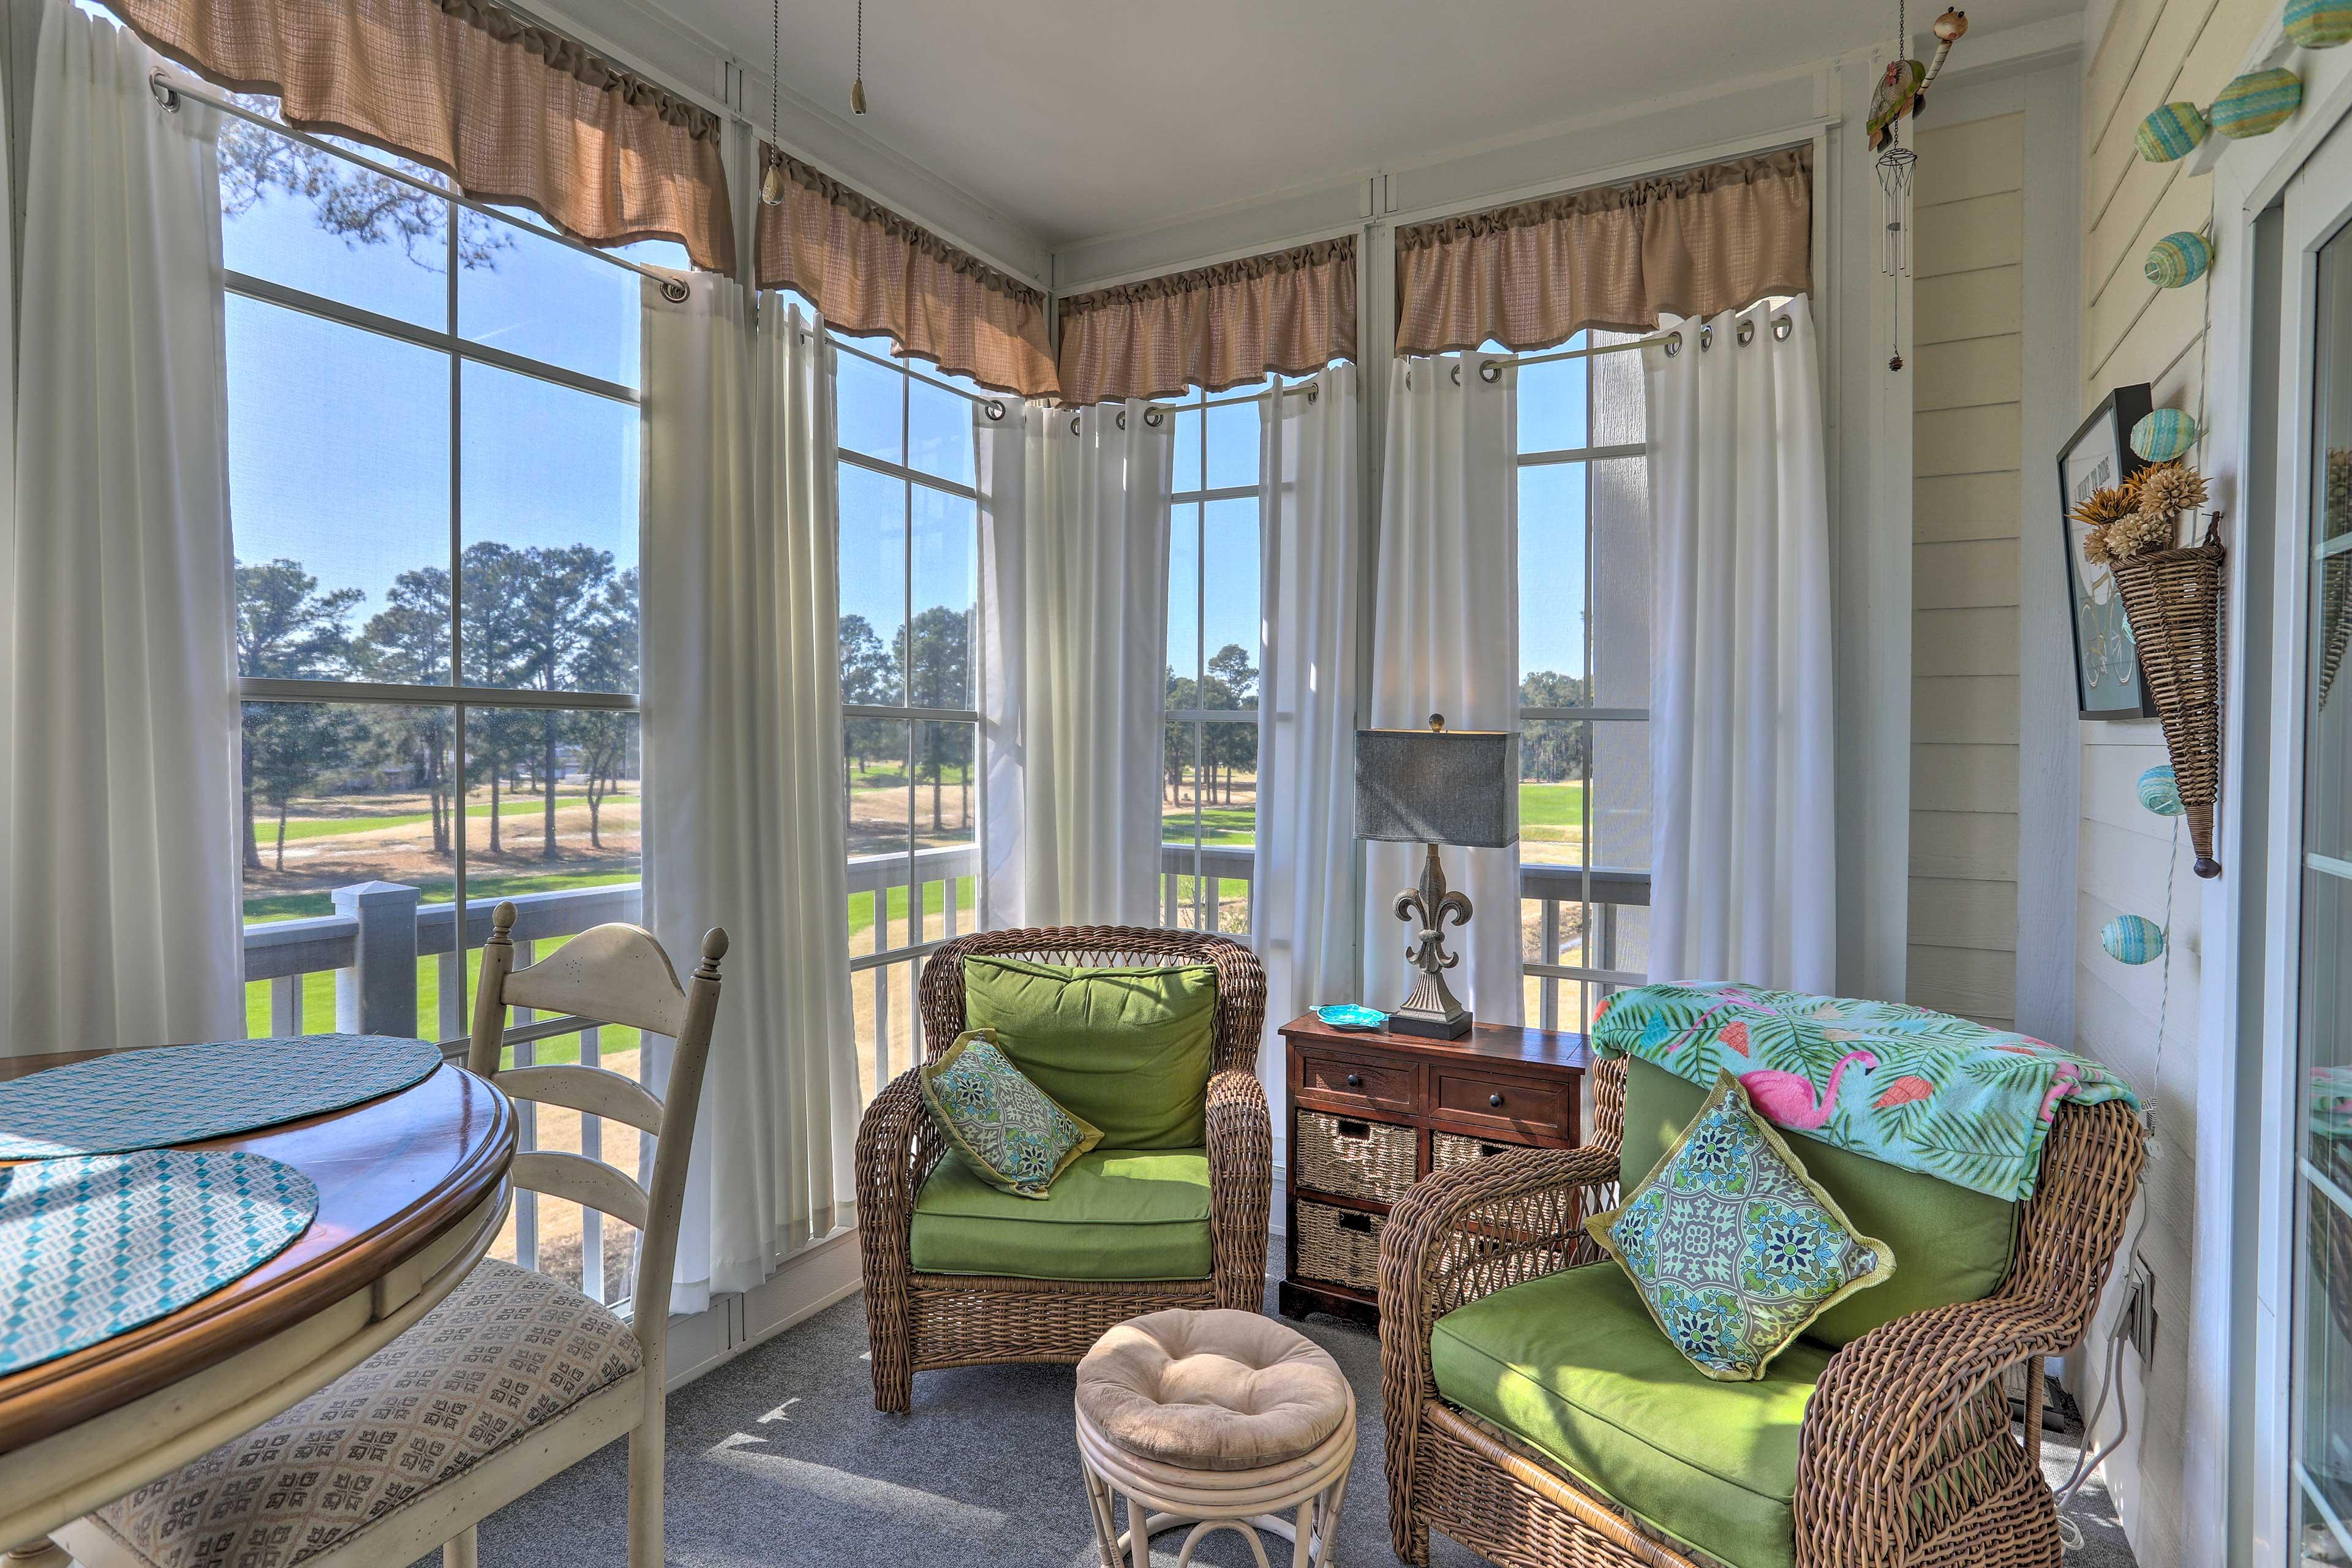 Natural light illuminates the bright and breezy sunroom!